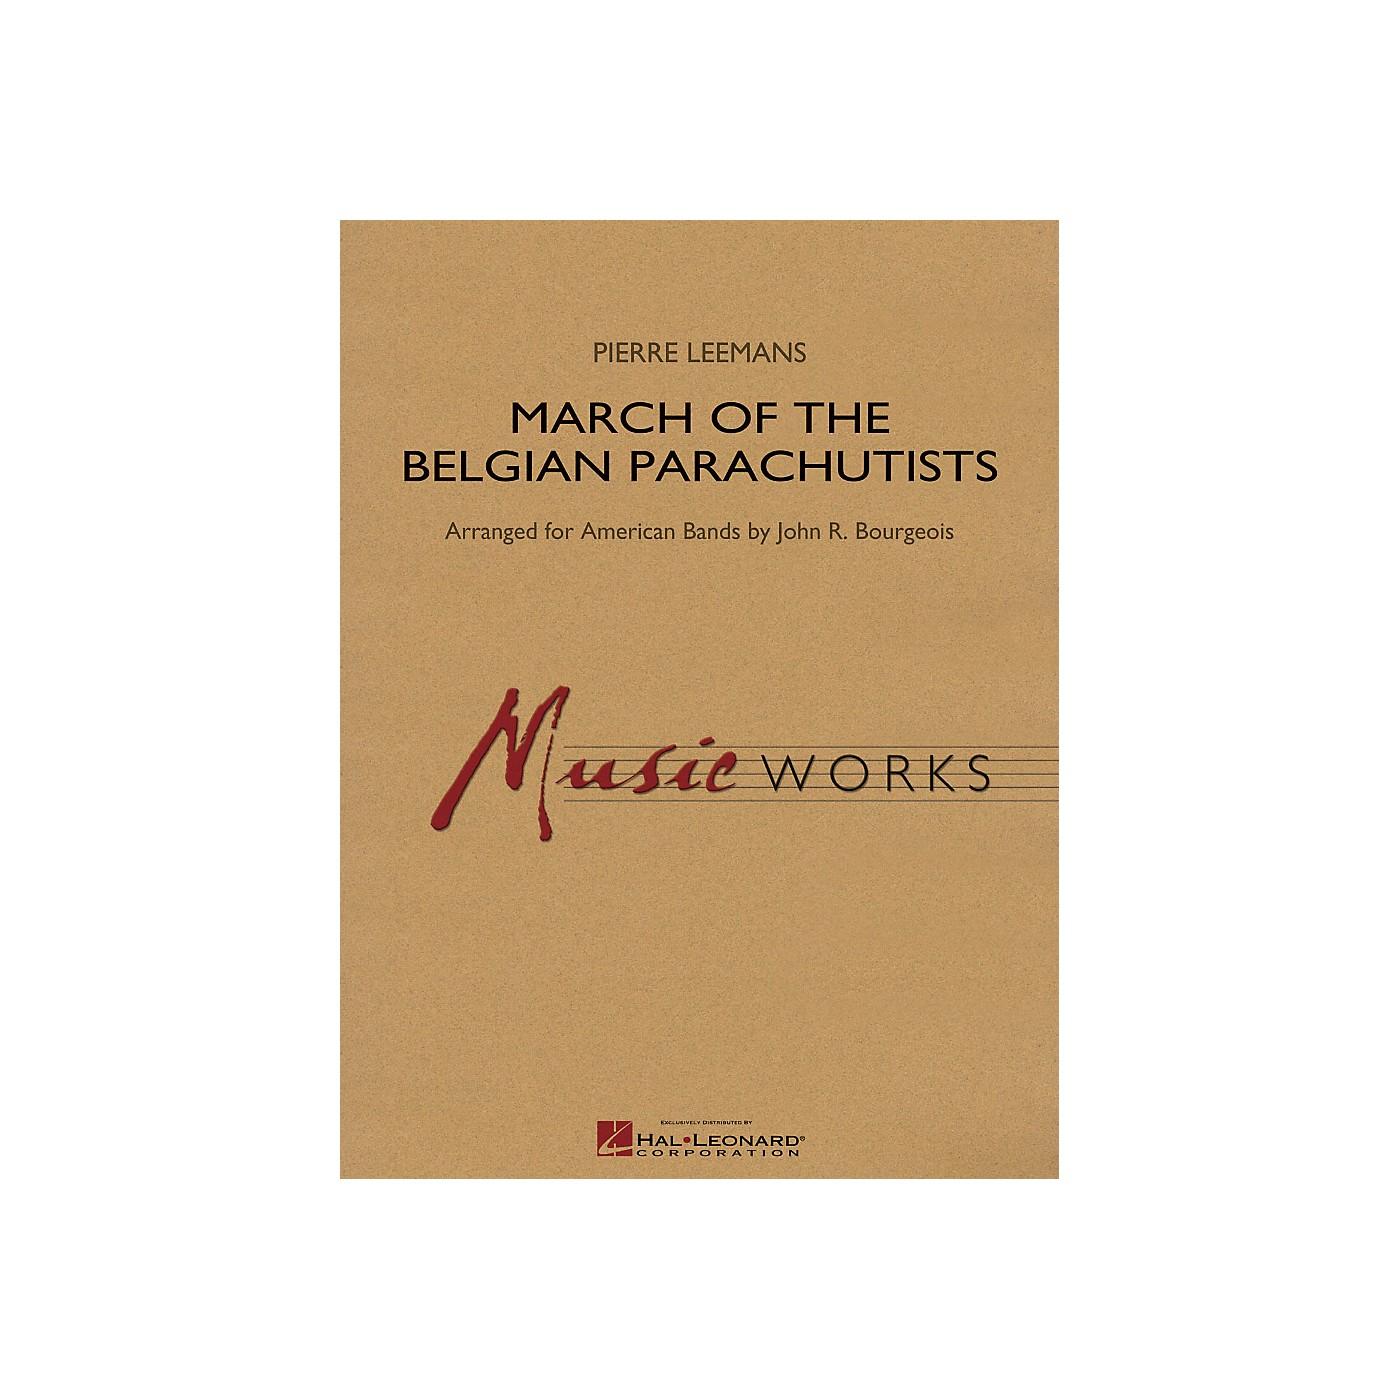 Hal Leonard March Of The Belgian Parachutists - Music Works Series Grade 4 thumbnail